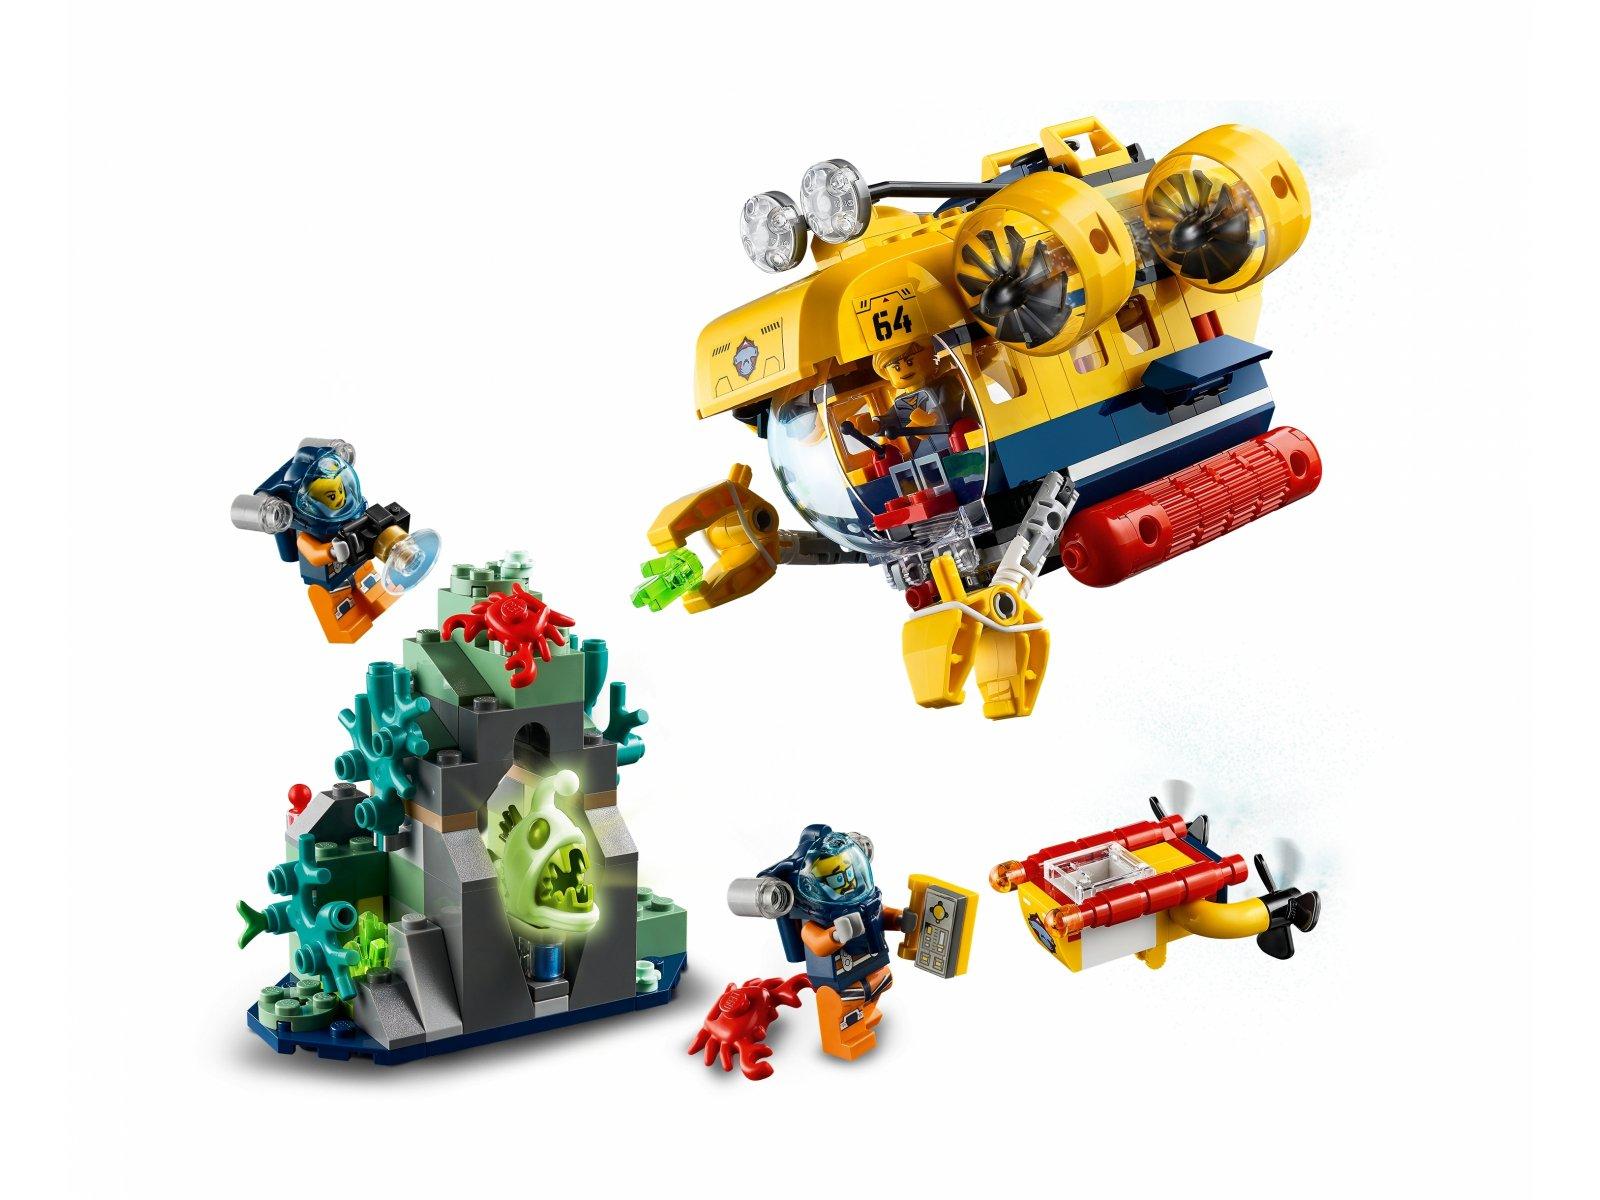 LEGO City 60264 Łódź podwodna badaczy oceanu